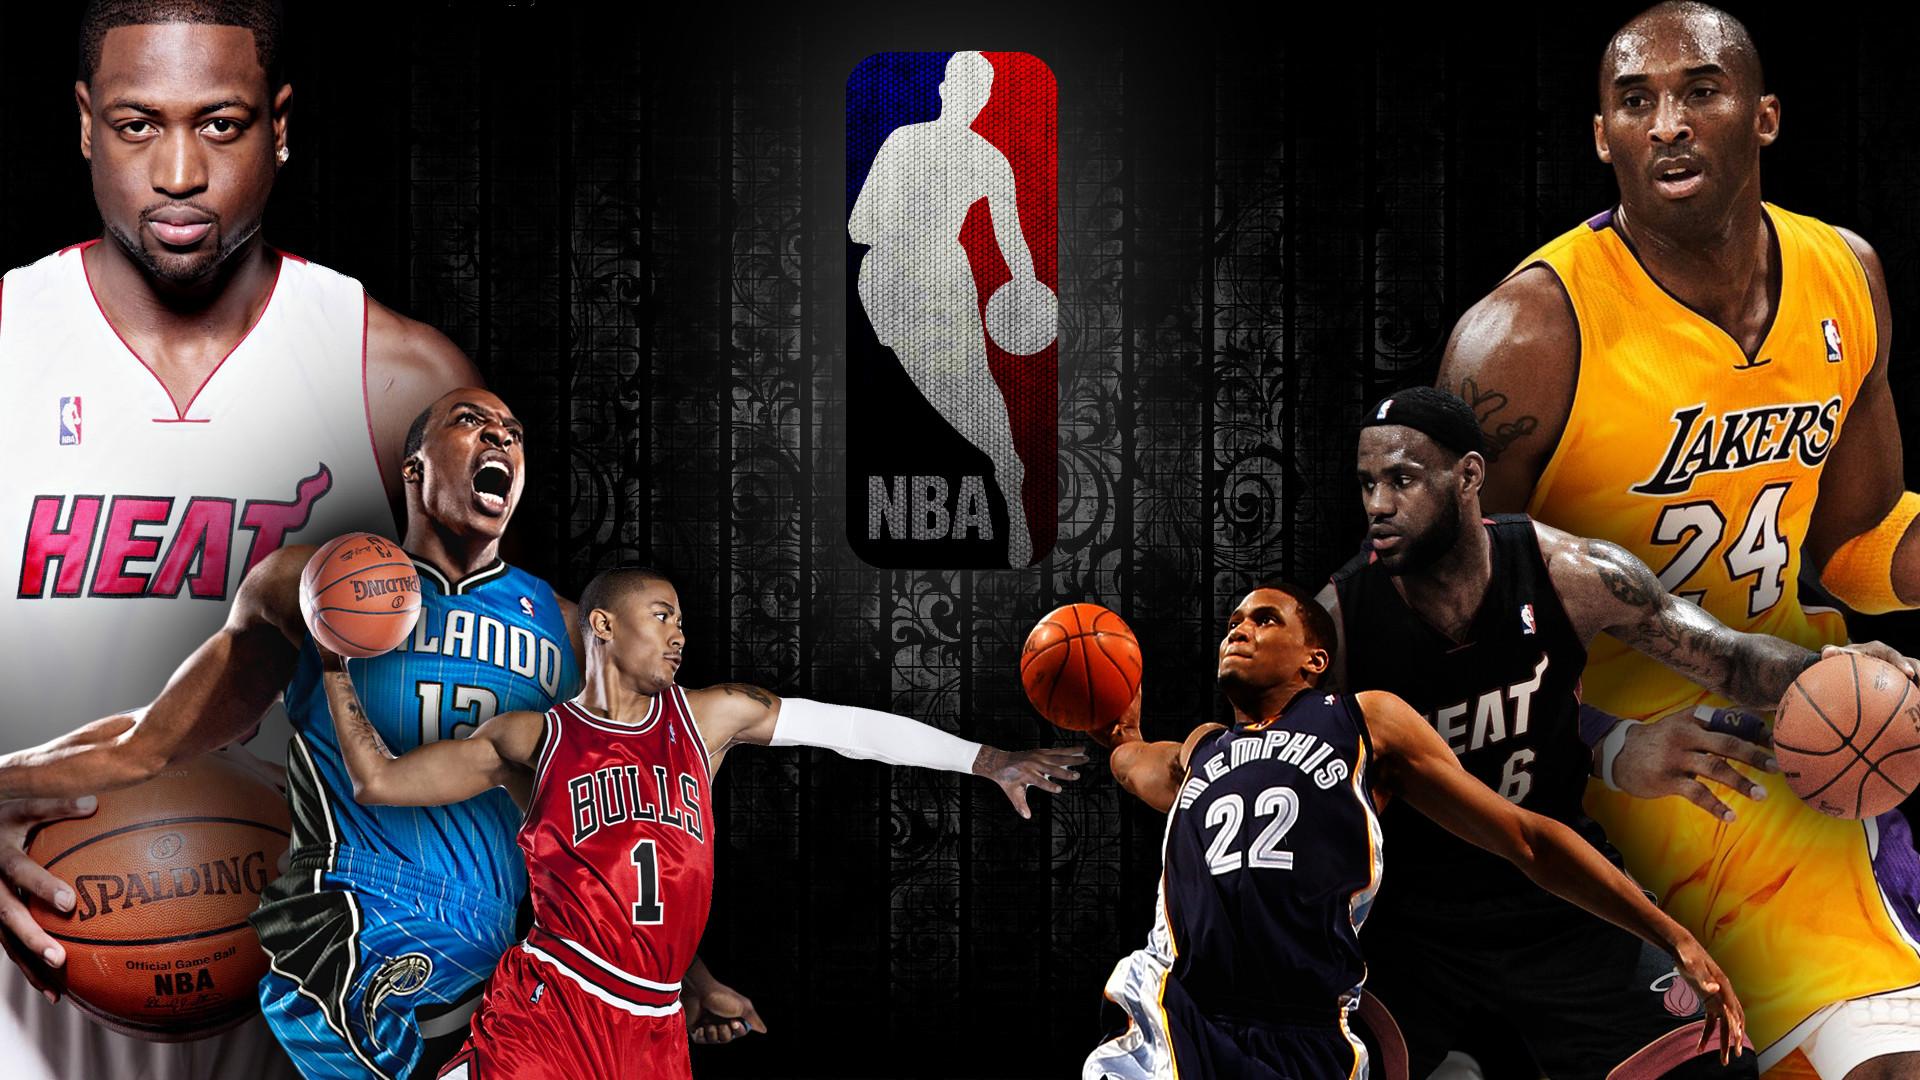 … nba basketball lakers wallpaper hd desktop wallpapers hd windows …